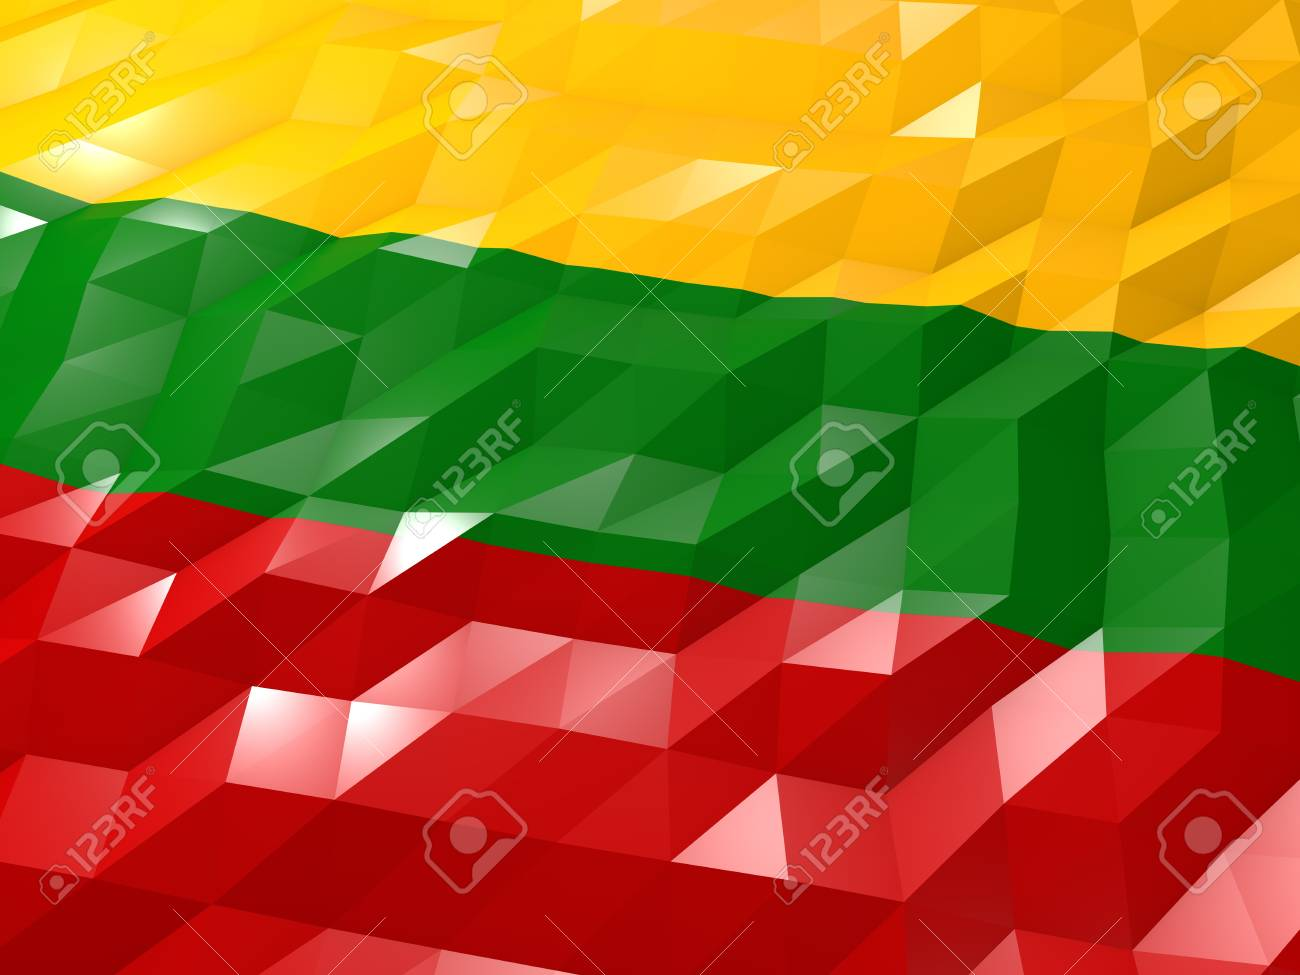 Flag Of Lithuania 3D Wallpaper Illustration National Symbol 1300x975